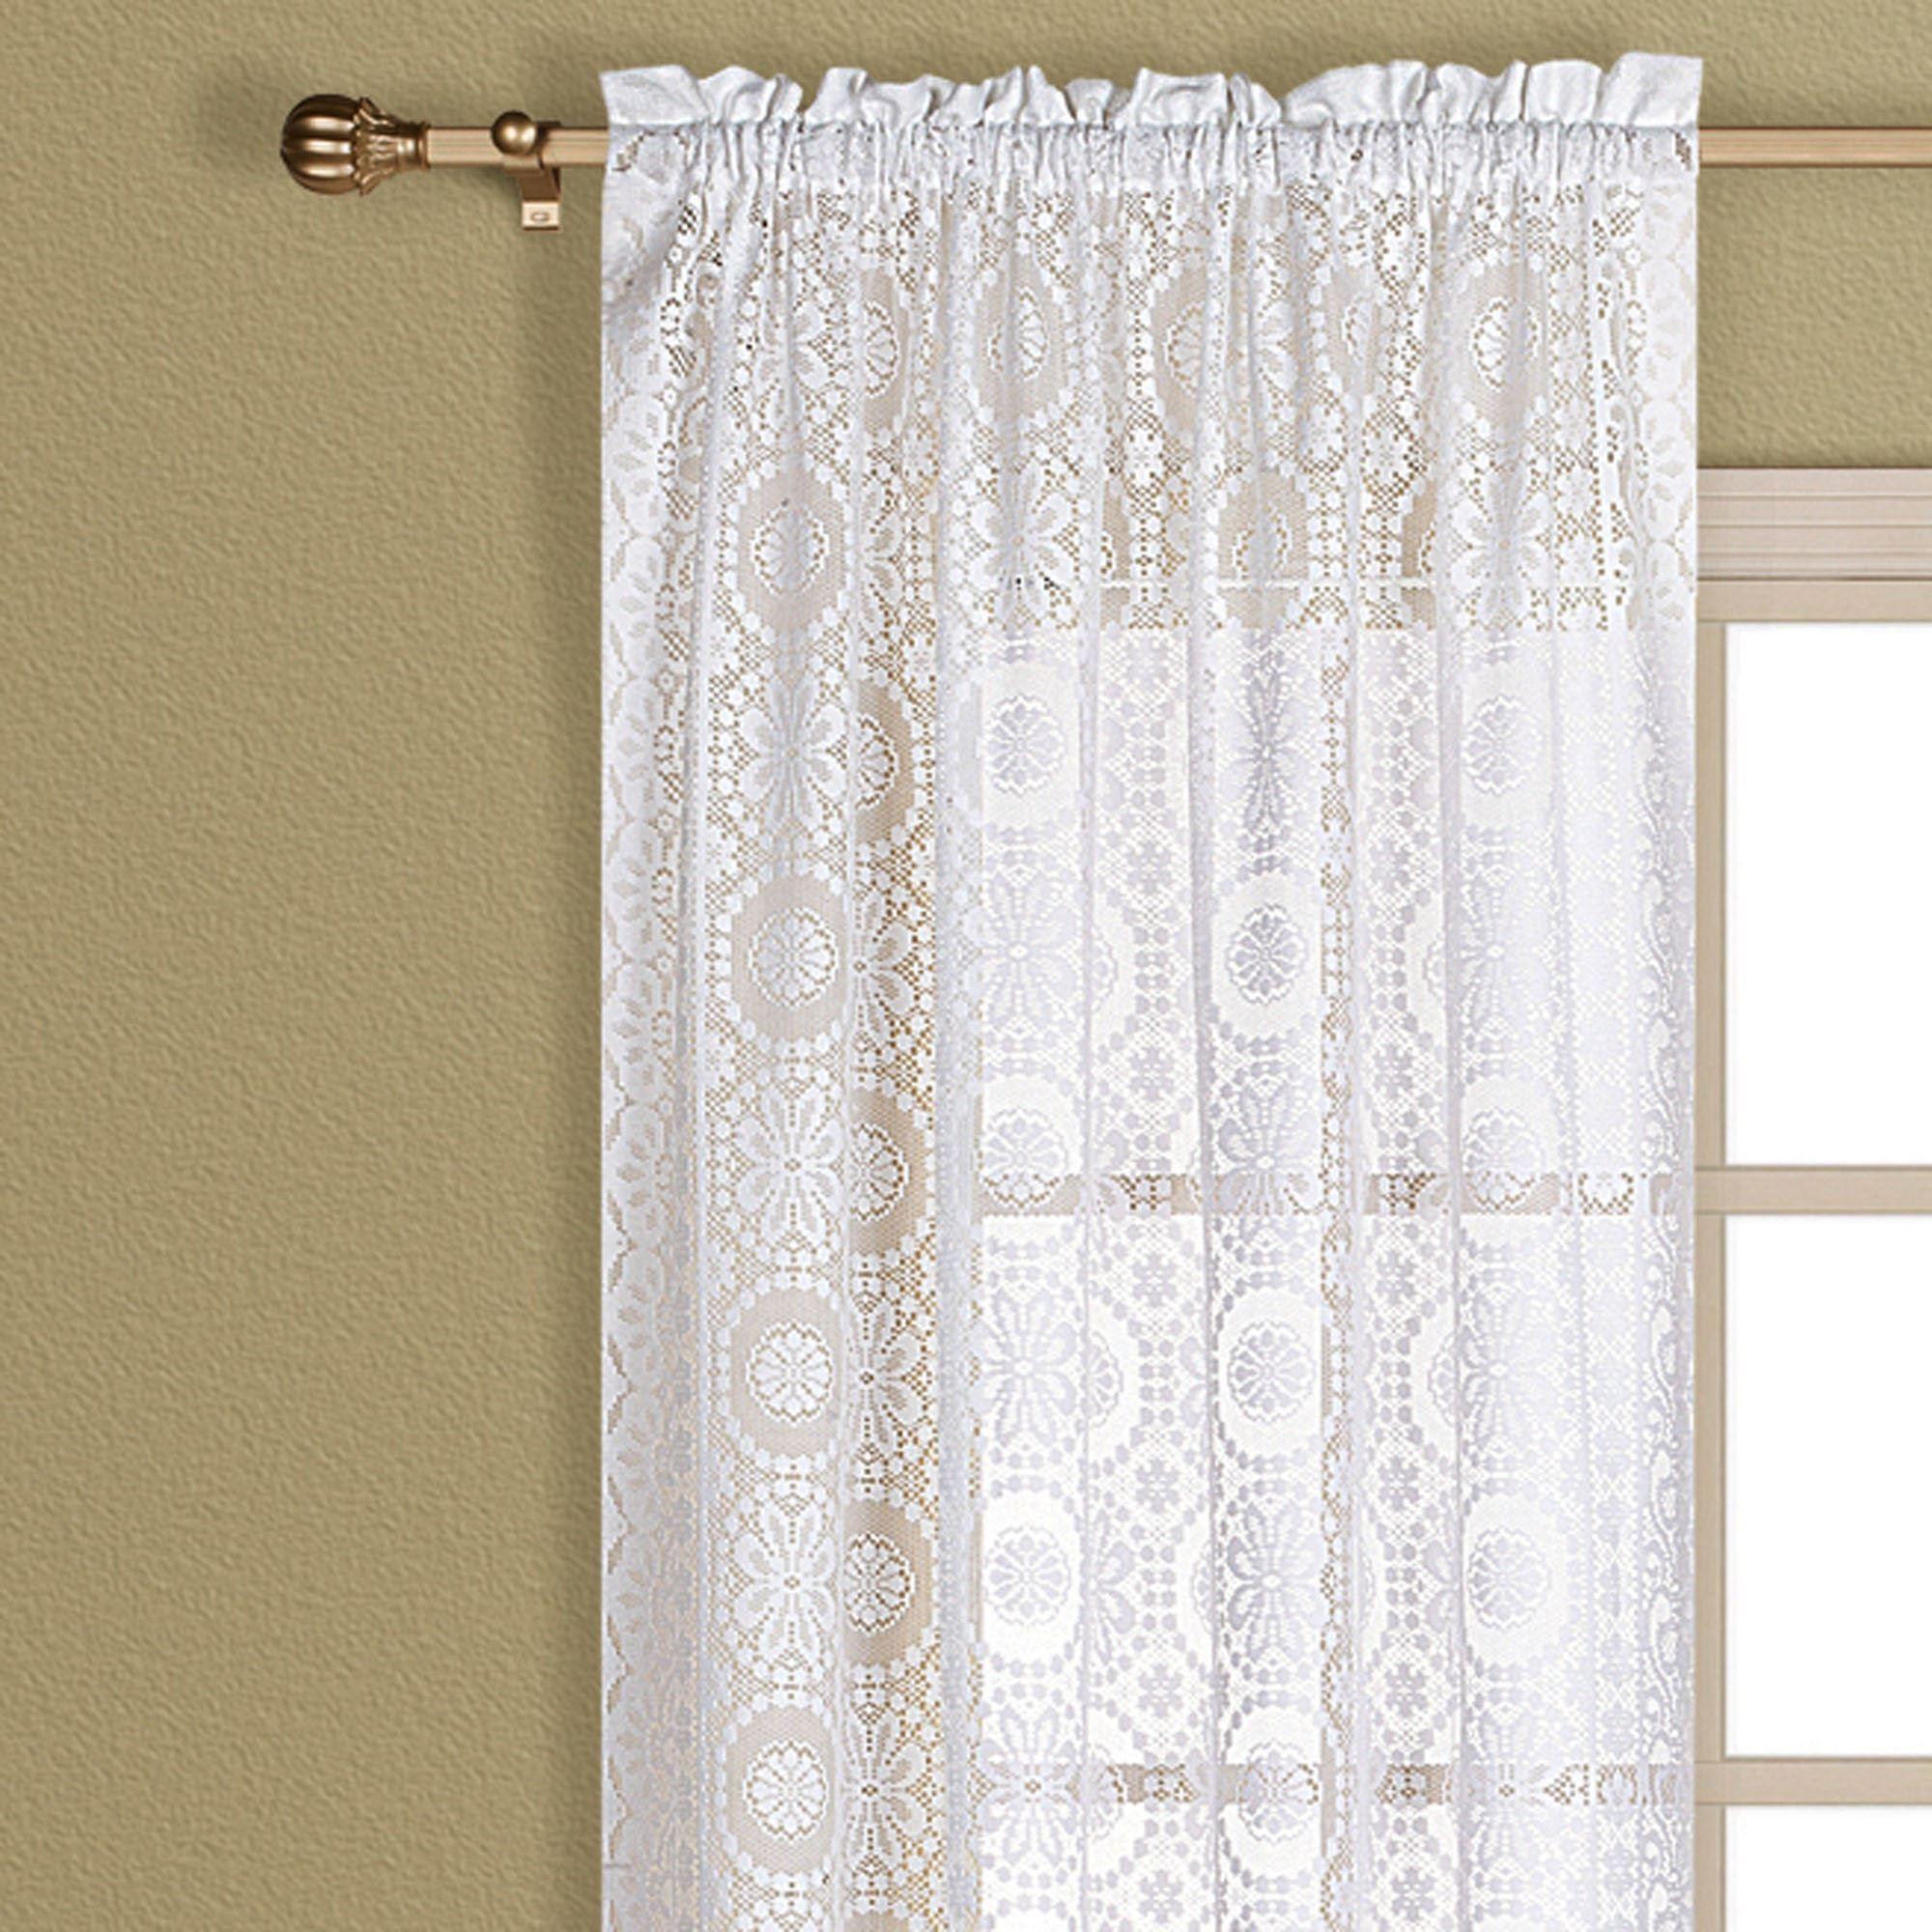 curtain window pin ideas treatments home pinterest onna treatment set